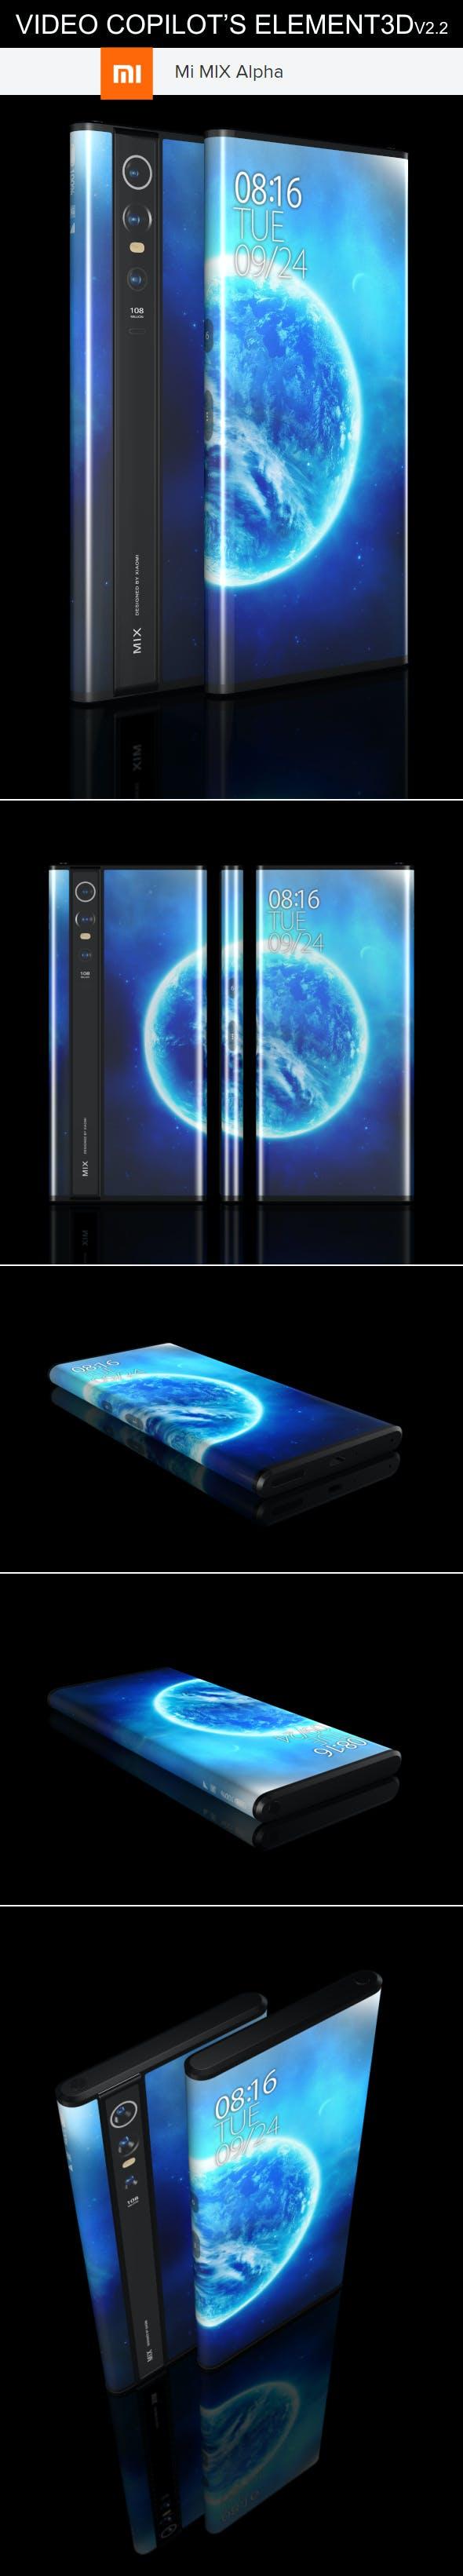 Element3D - Xiaomi Mi Mix Alpha - 3DOcean Item for Sale